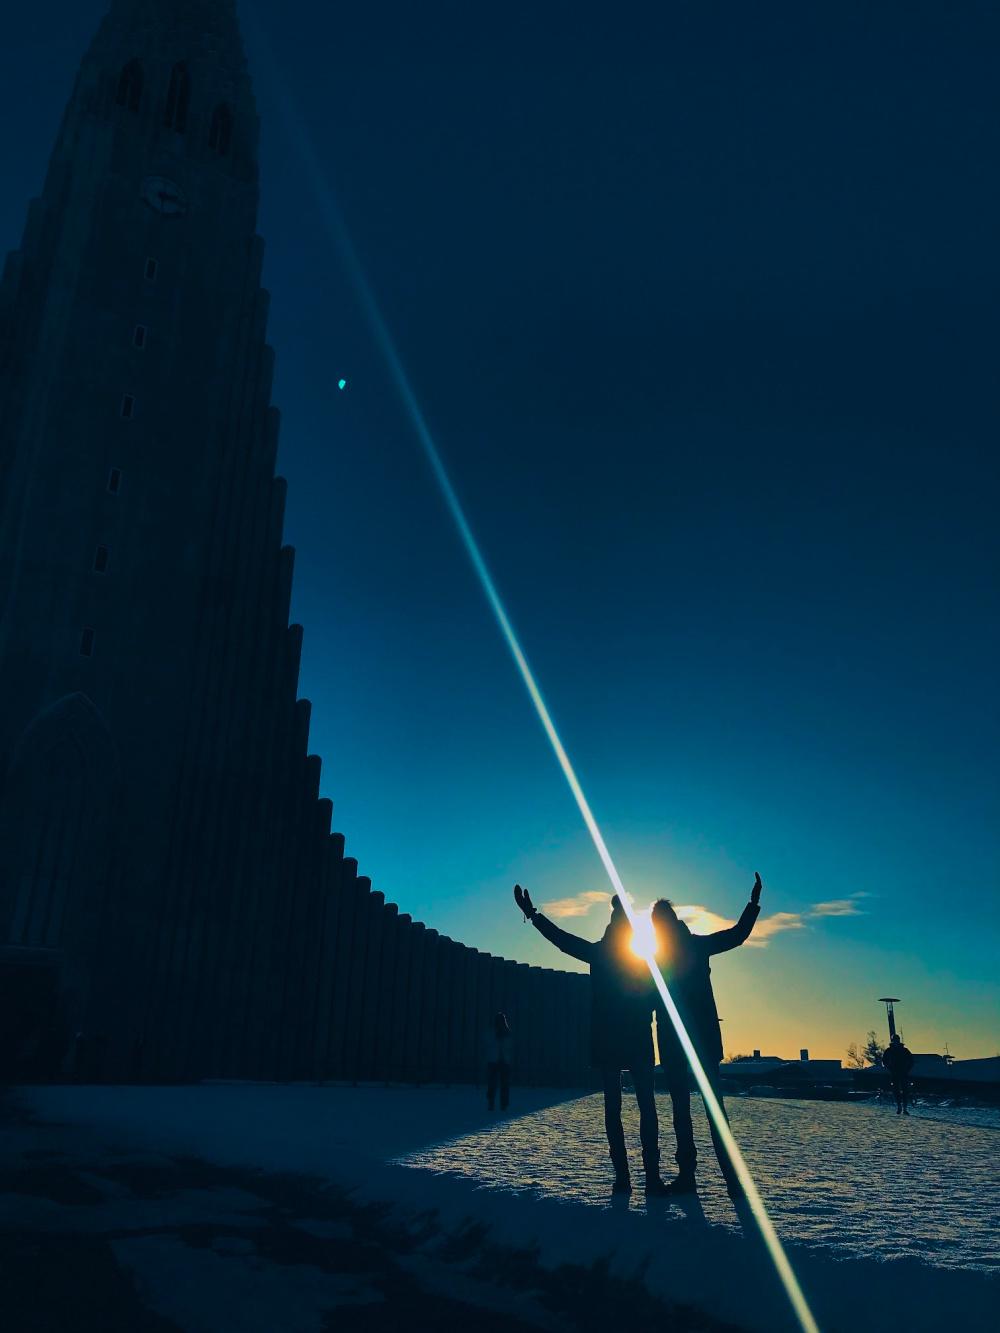 backlit-iceland-silhouette-2097093(1).jpg